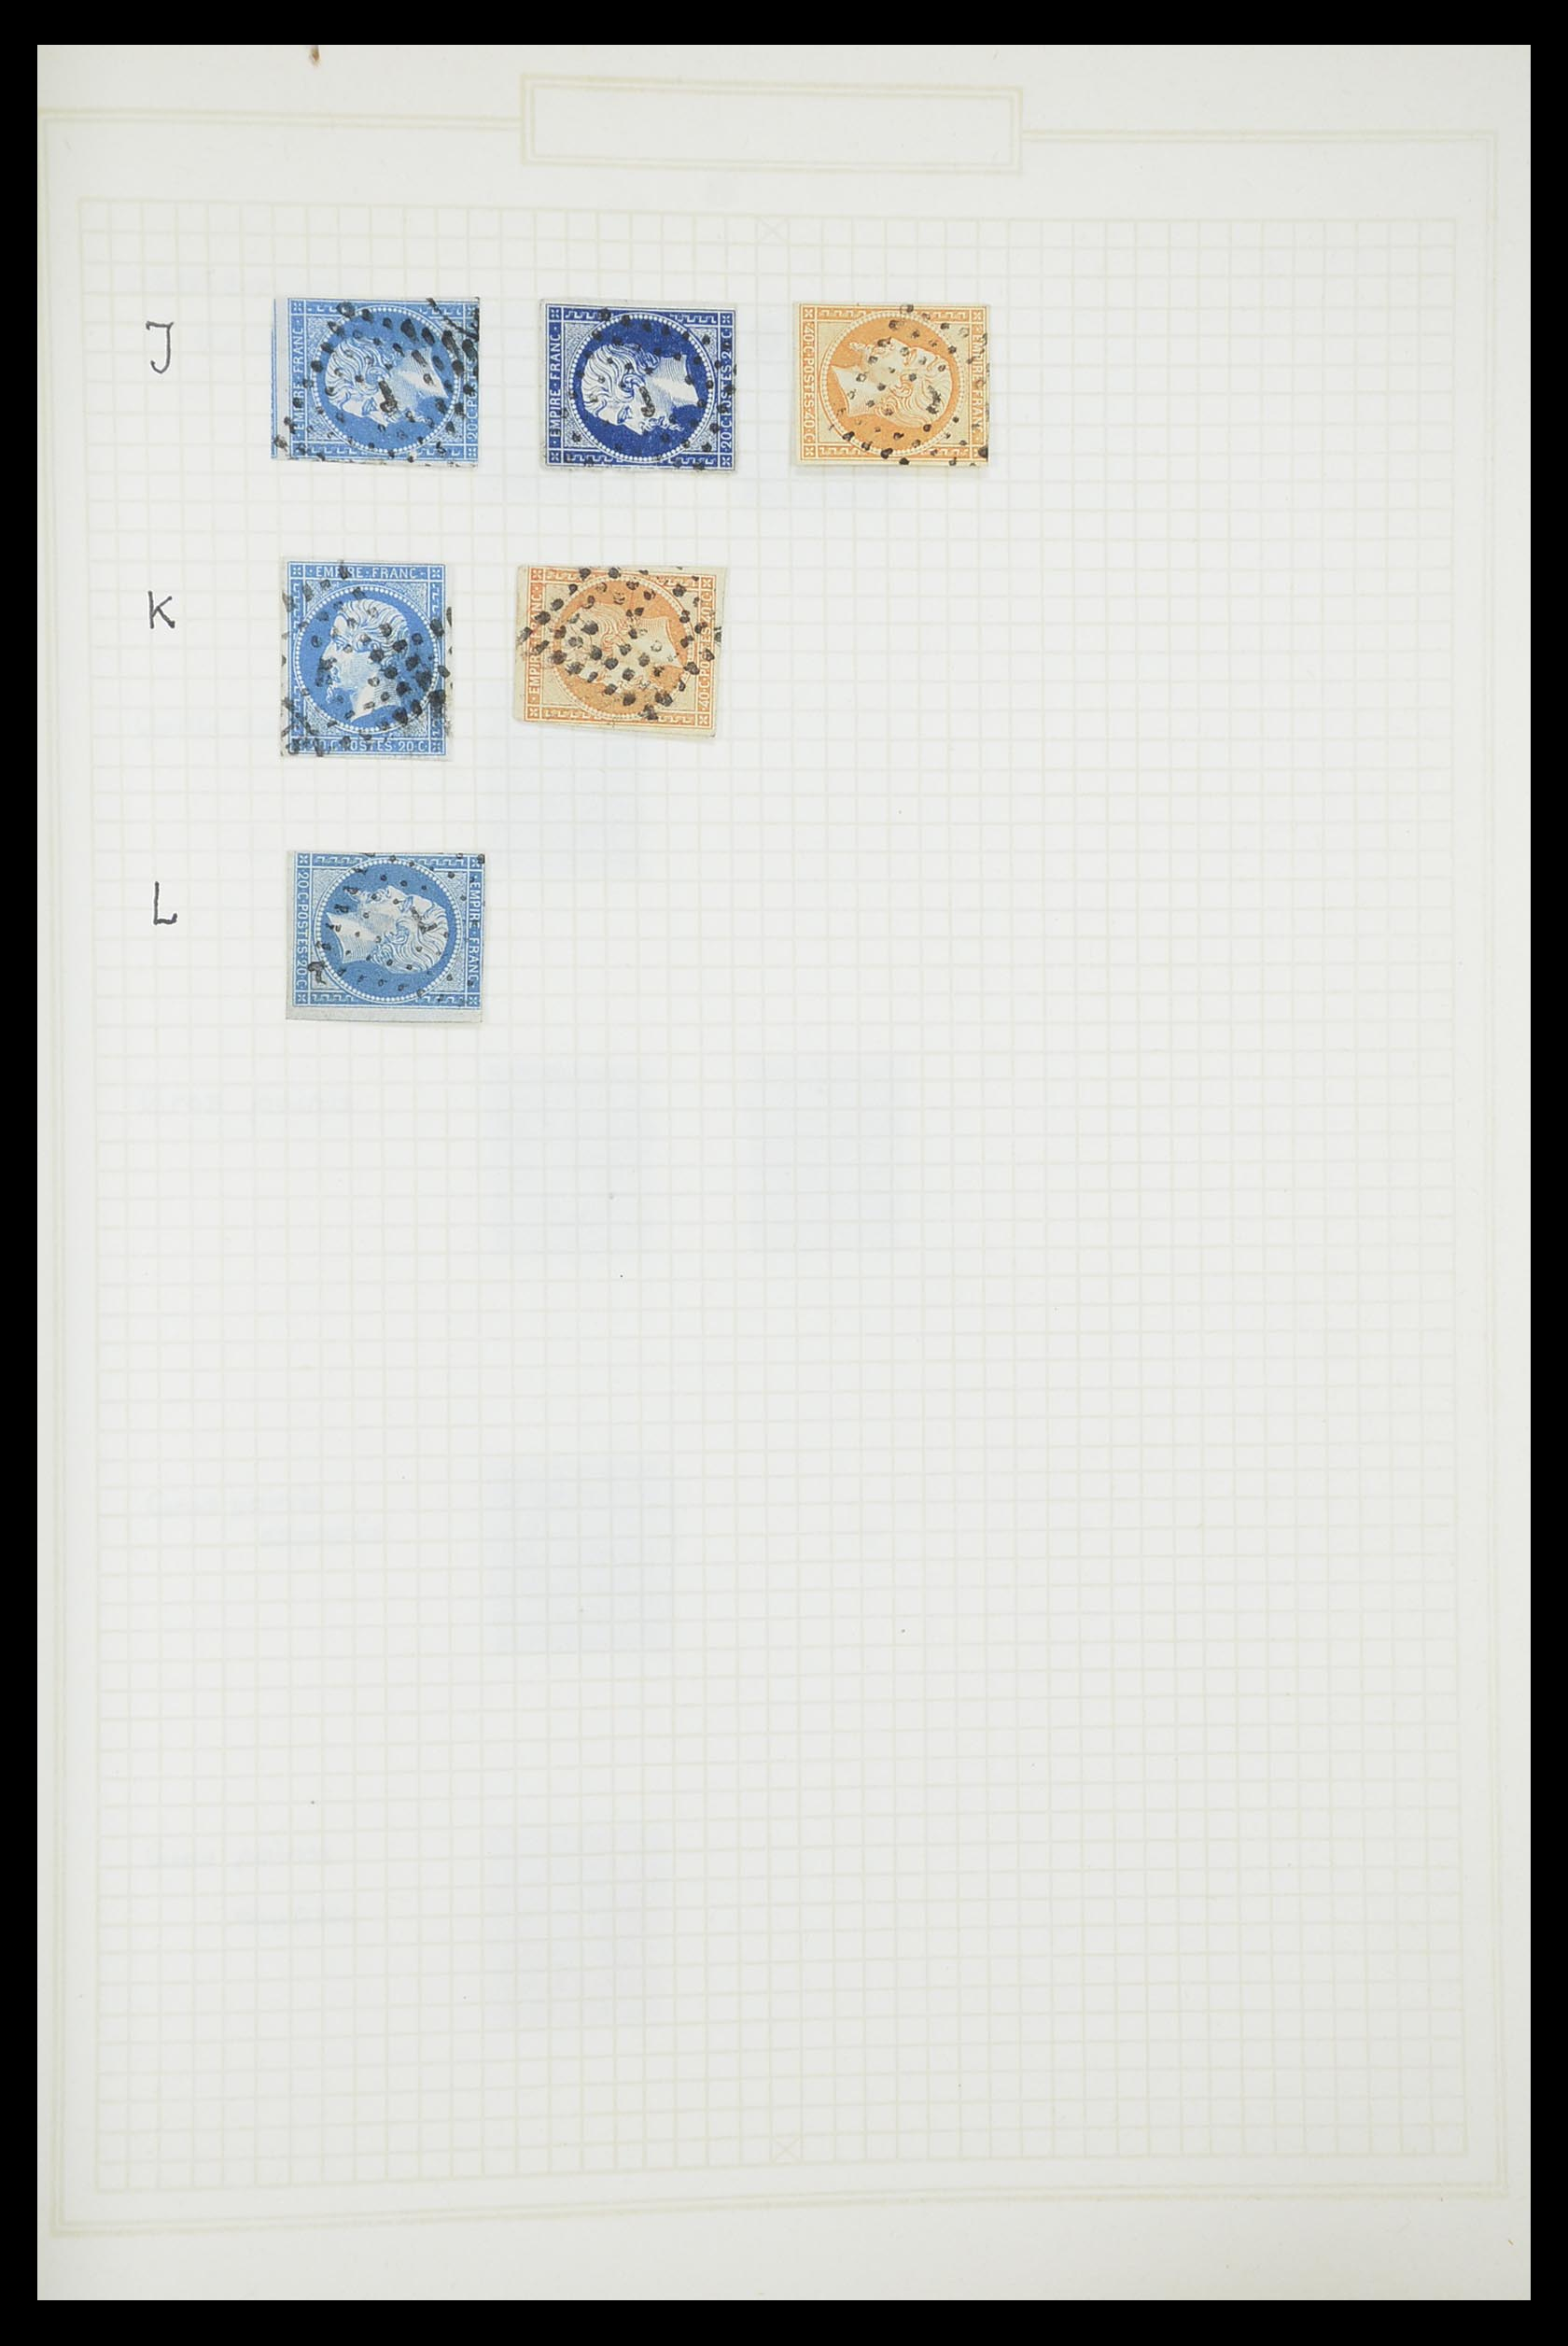 33851 020 - Postzegelverzameling 33851 Frankrijk klassiek stempels.